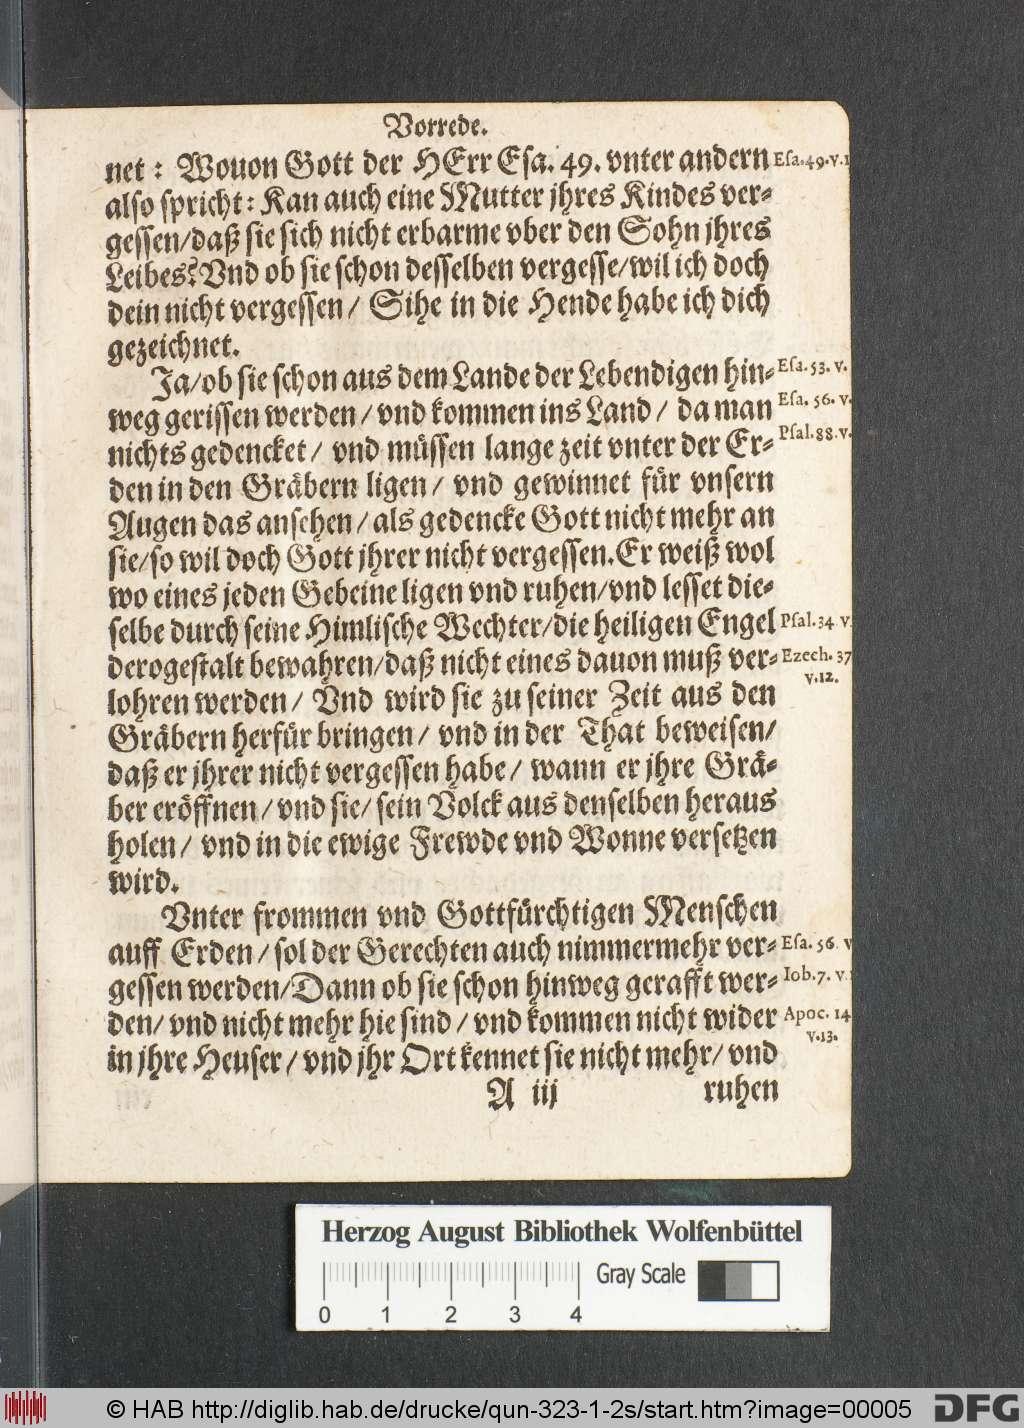 http://diglib.hab.de/drucke/qun-323-1-2s/00005.jpg